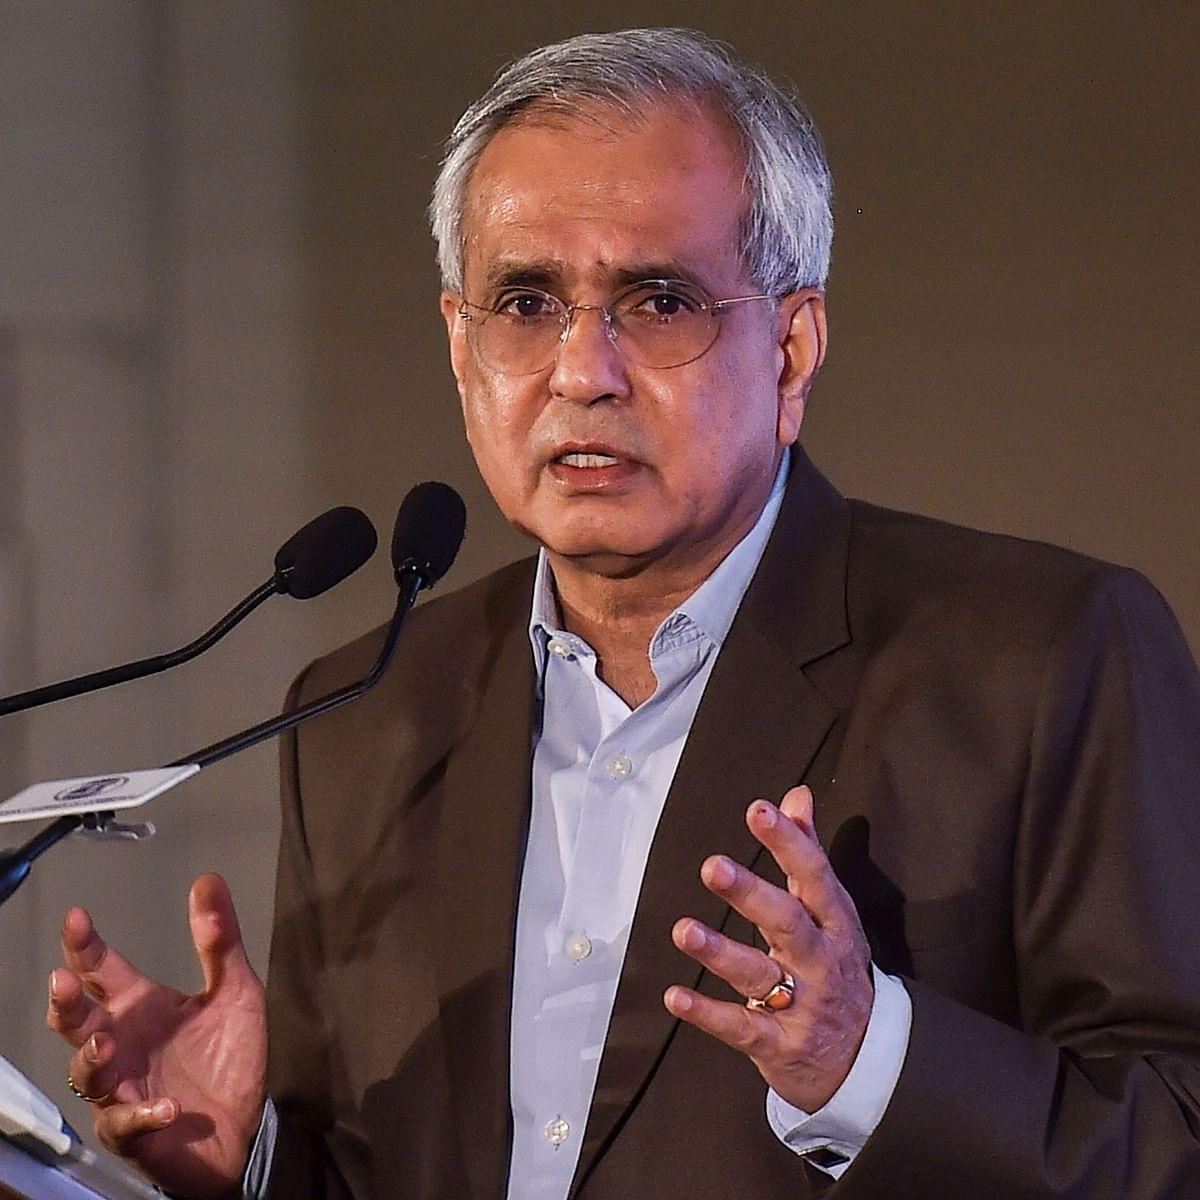 India may post 6% growth next fiscal, says Niti Aayog's Rajiv Kumar